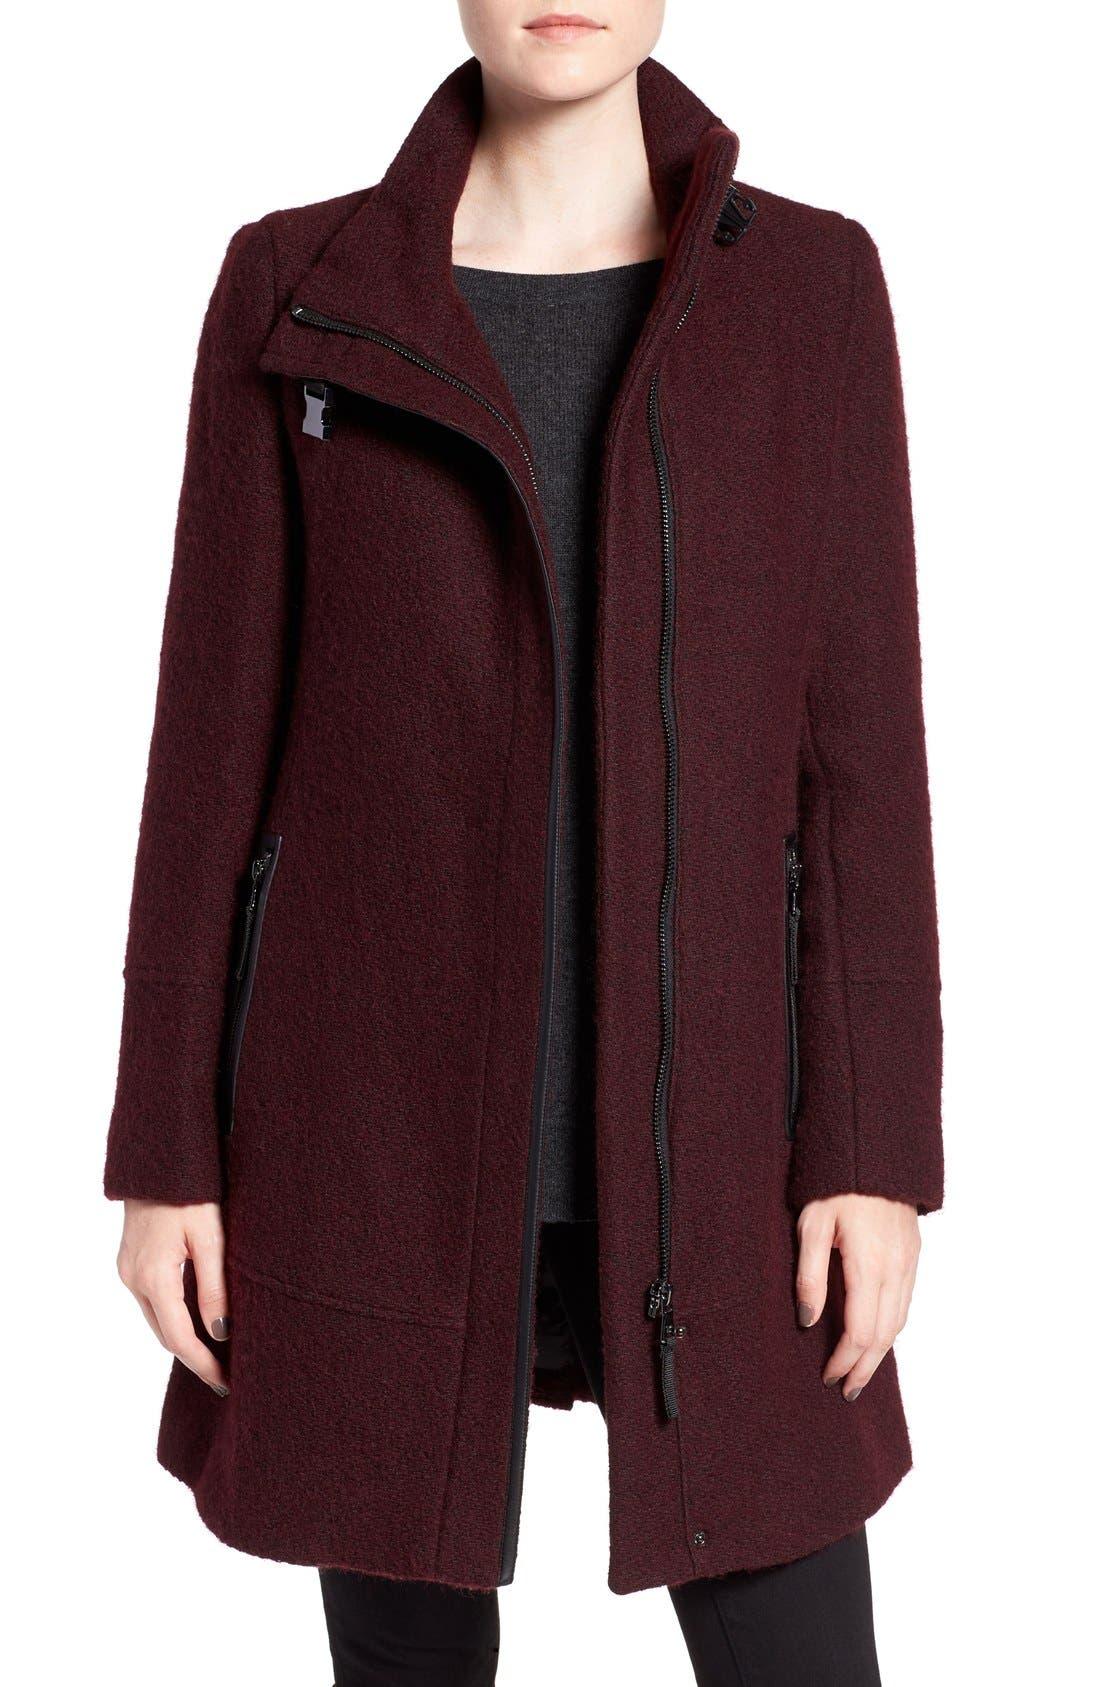 Alternate Image 1 Selected - Calvin Klein Wool Blend Bouclé Walking Jacket (Regular & Petite)